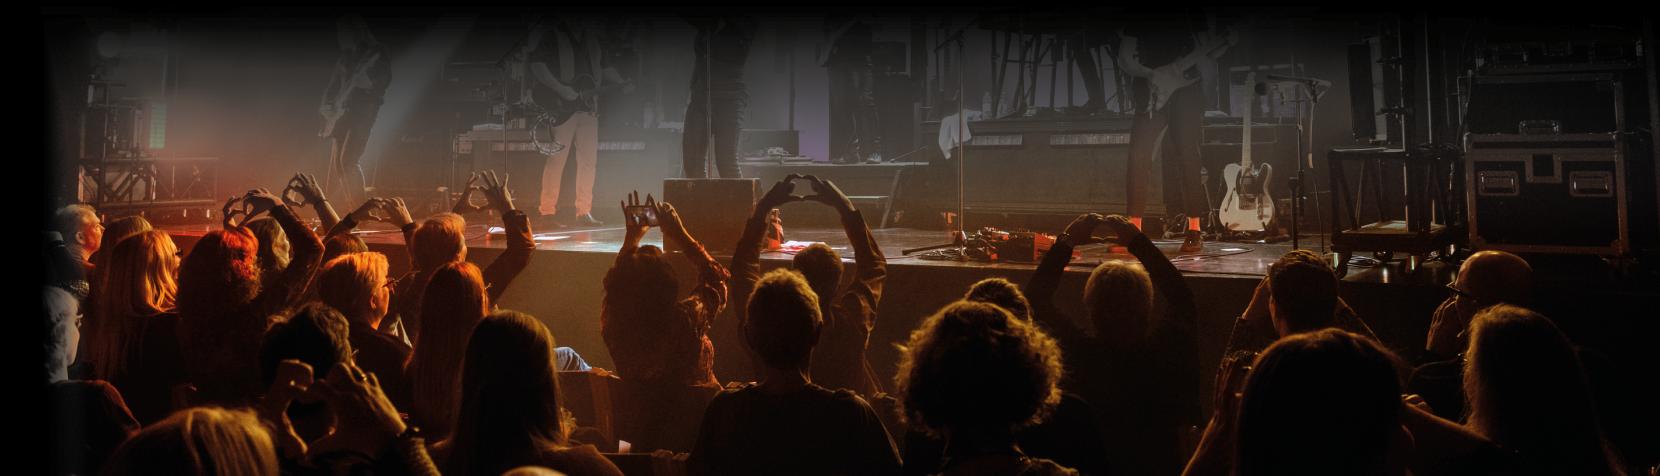 Koncertpublikum, 2020 - Foto: Jan Palle